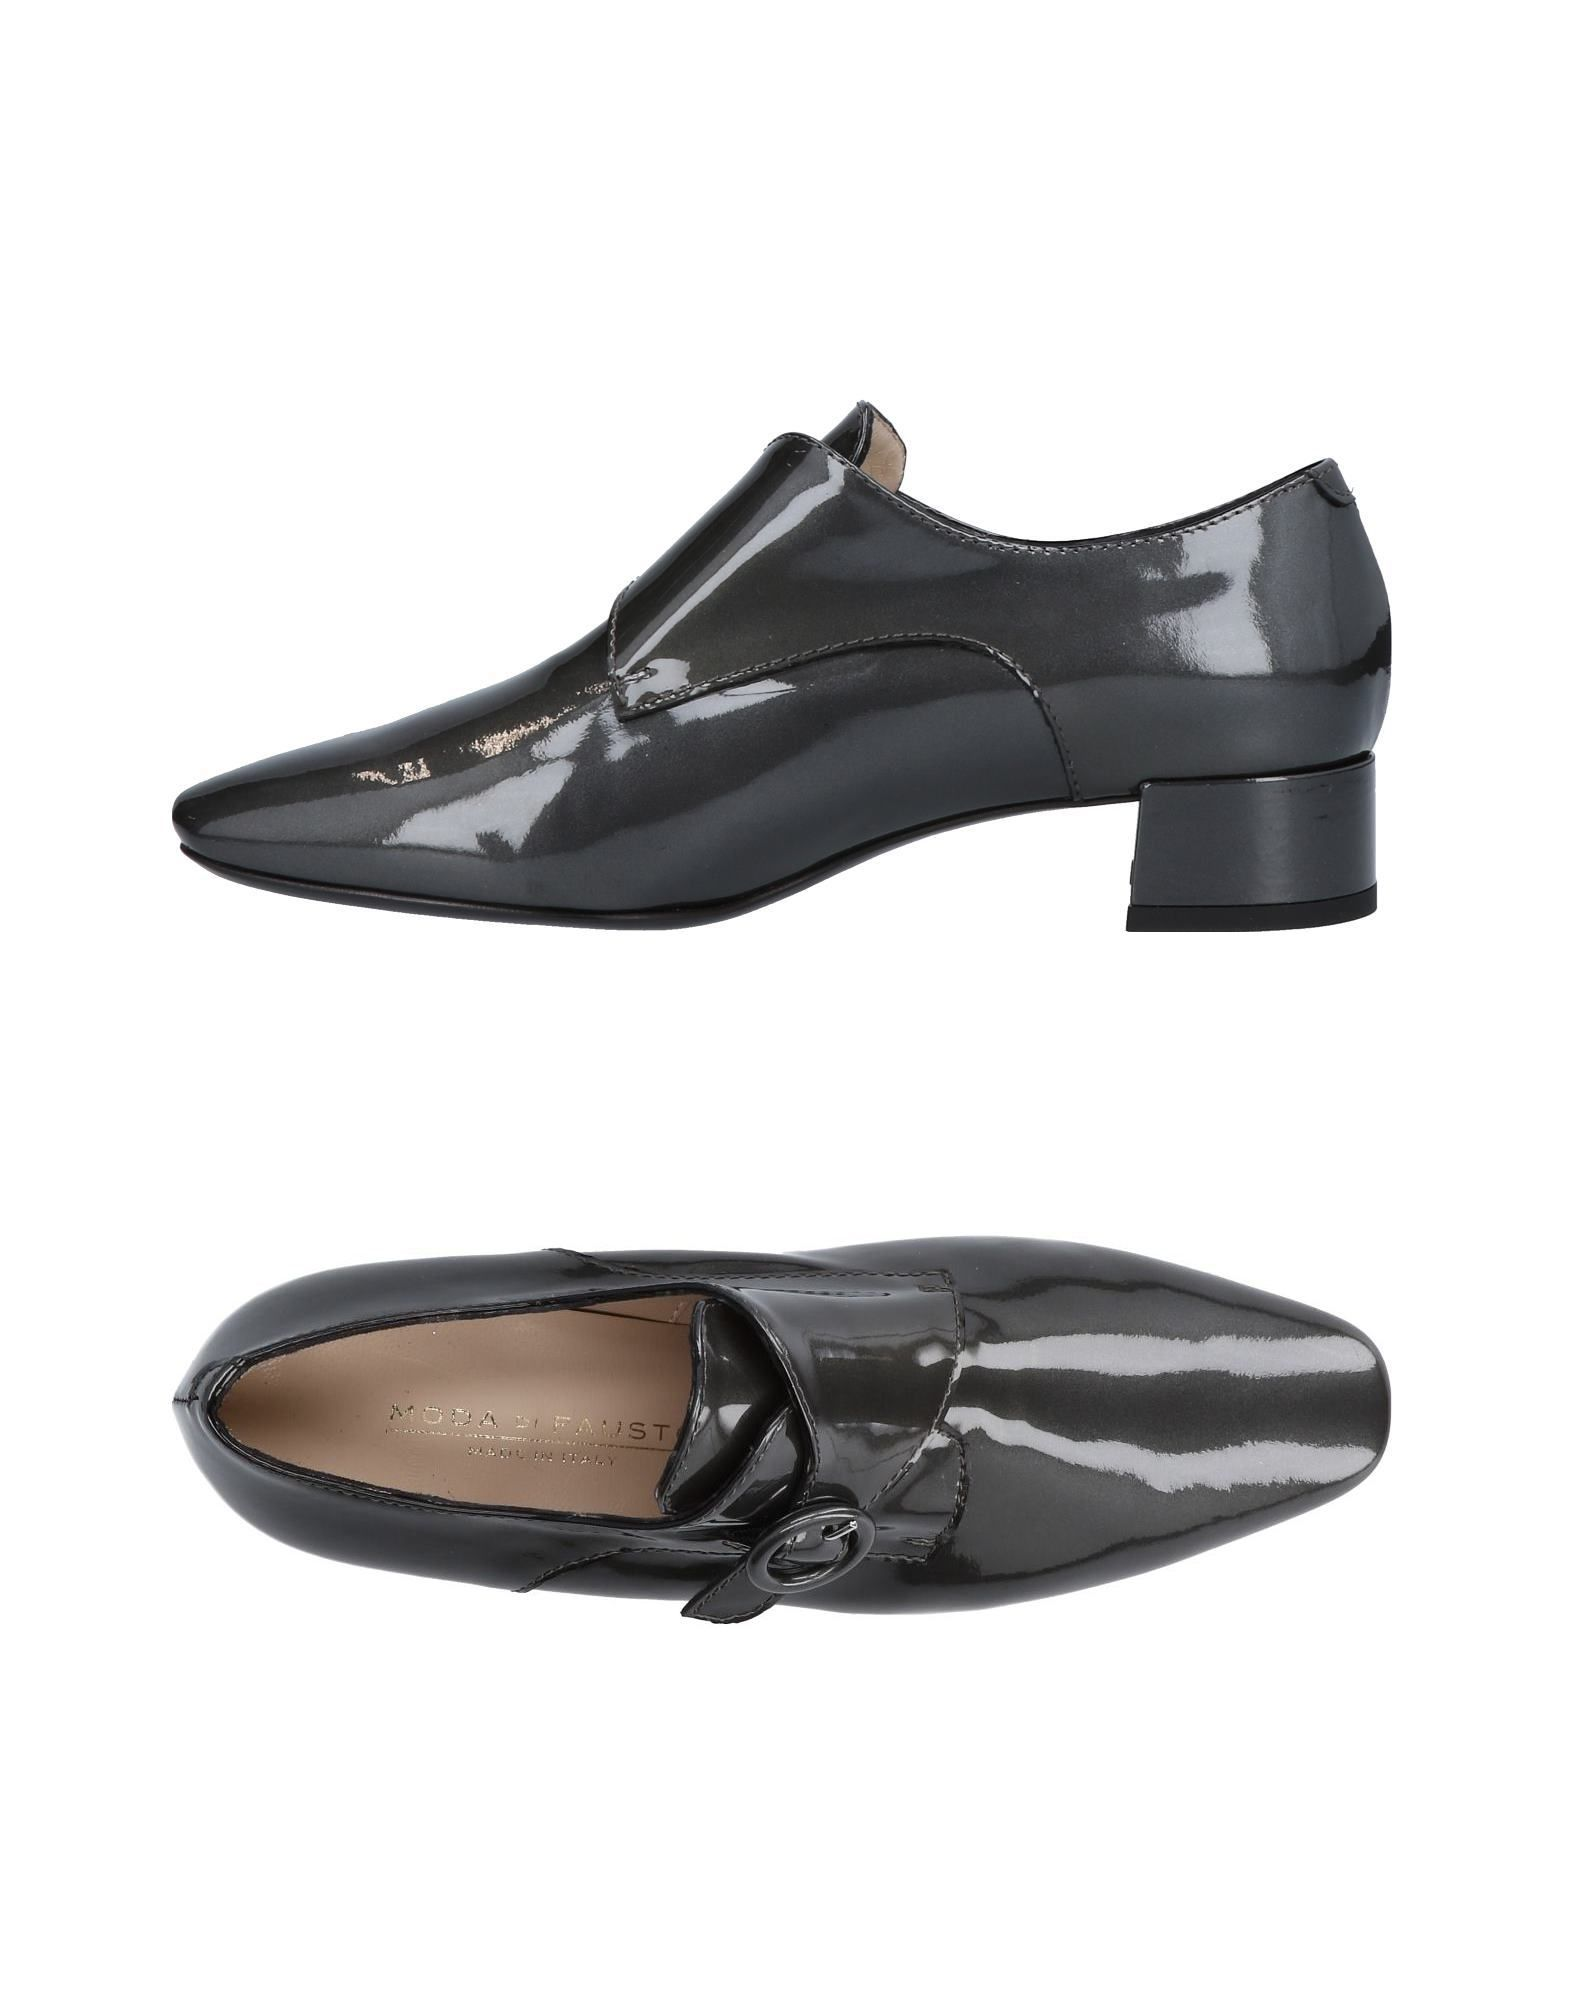 Stilvolle billige Mokassins Schuhe Moda Di Fausto Mokassins billige Damen  11460907XS 45924a